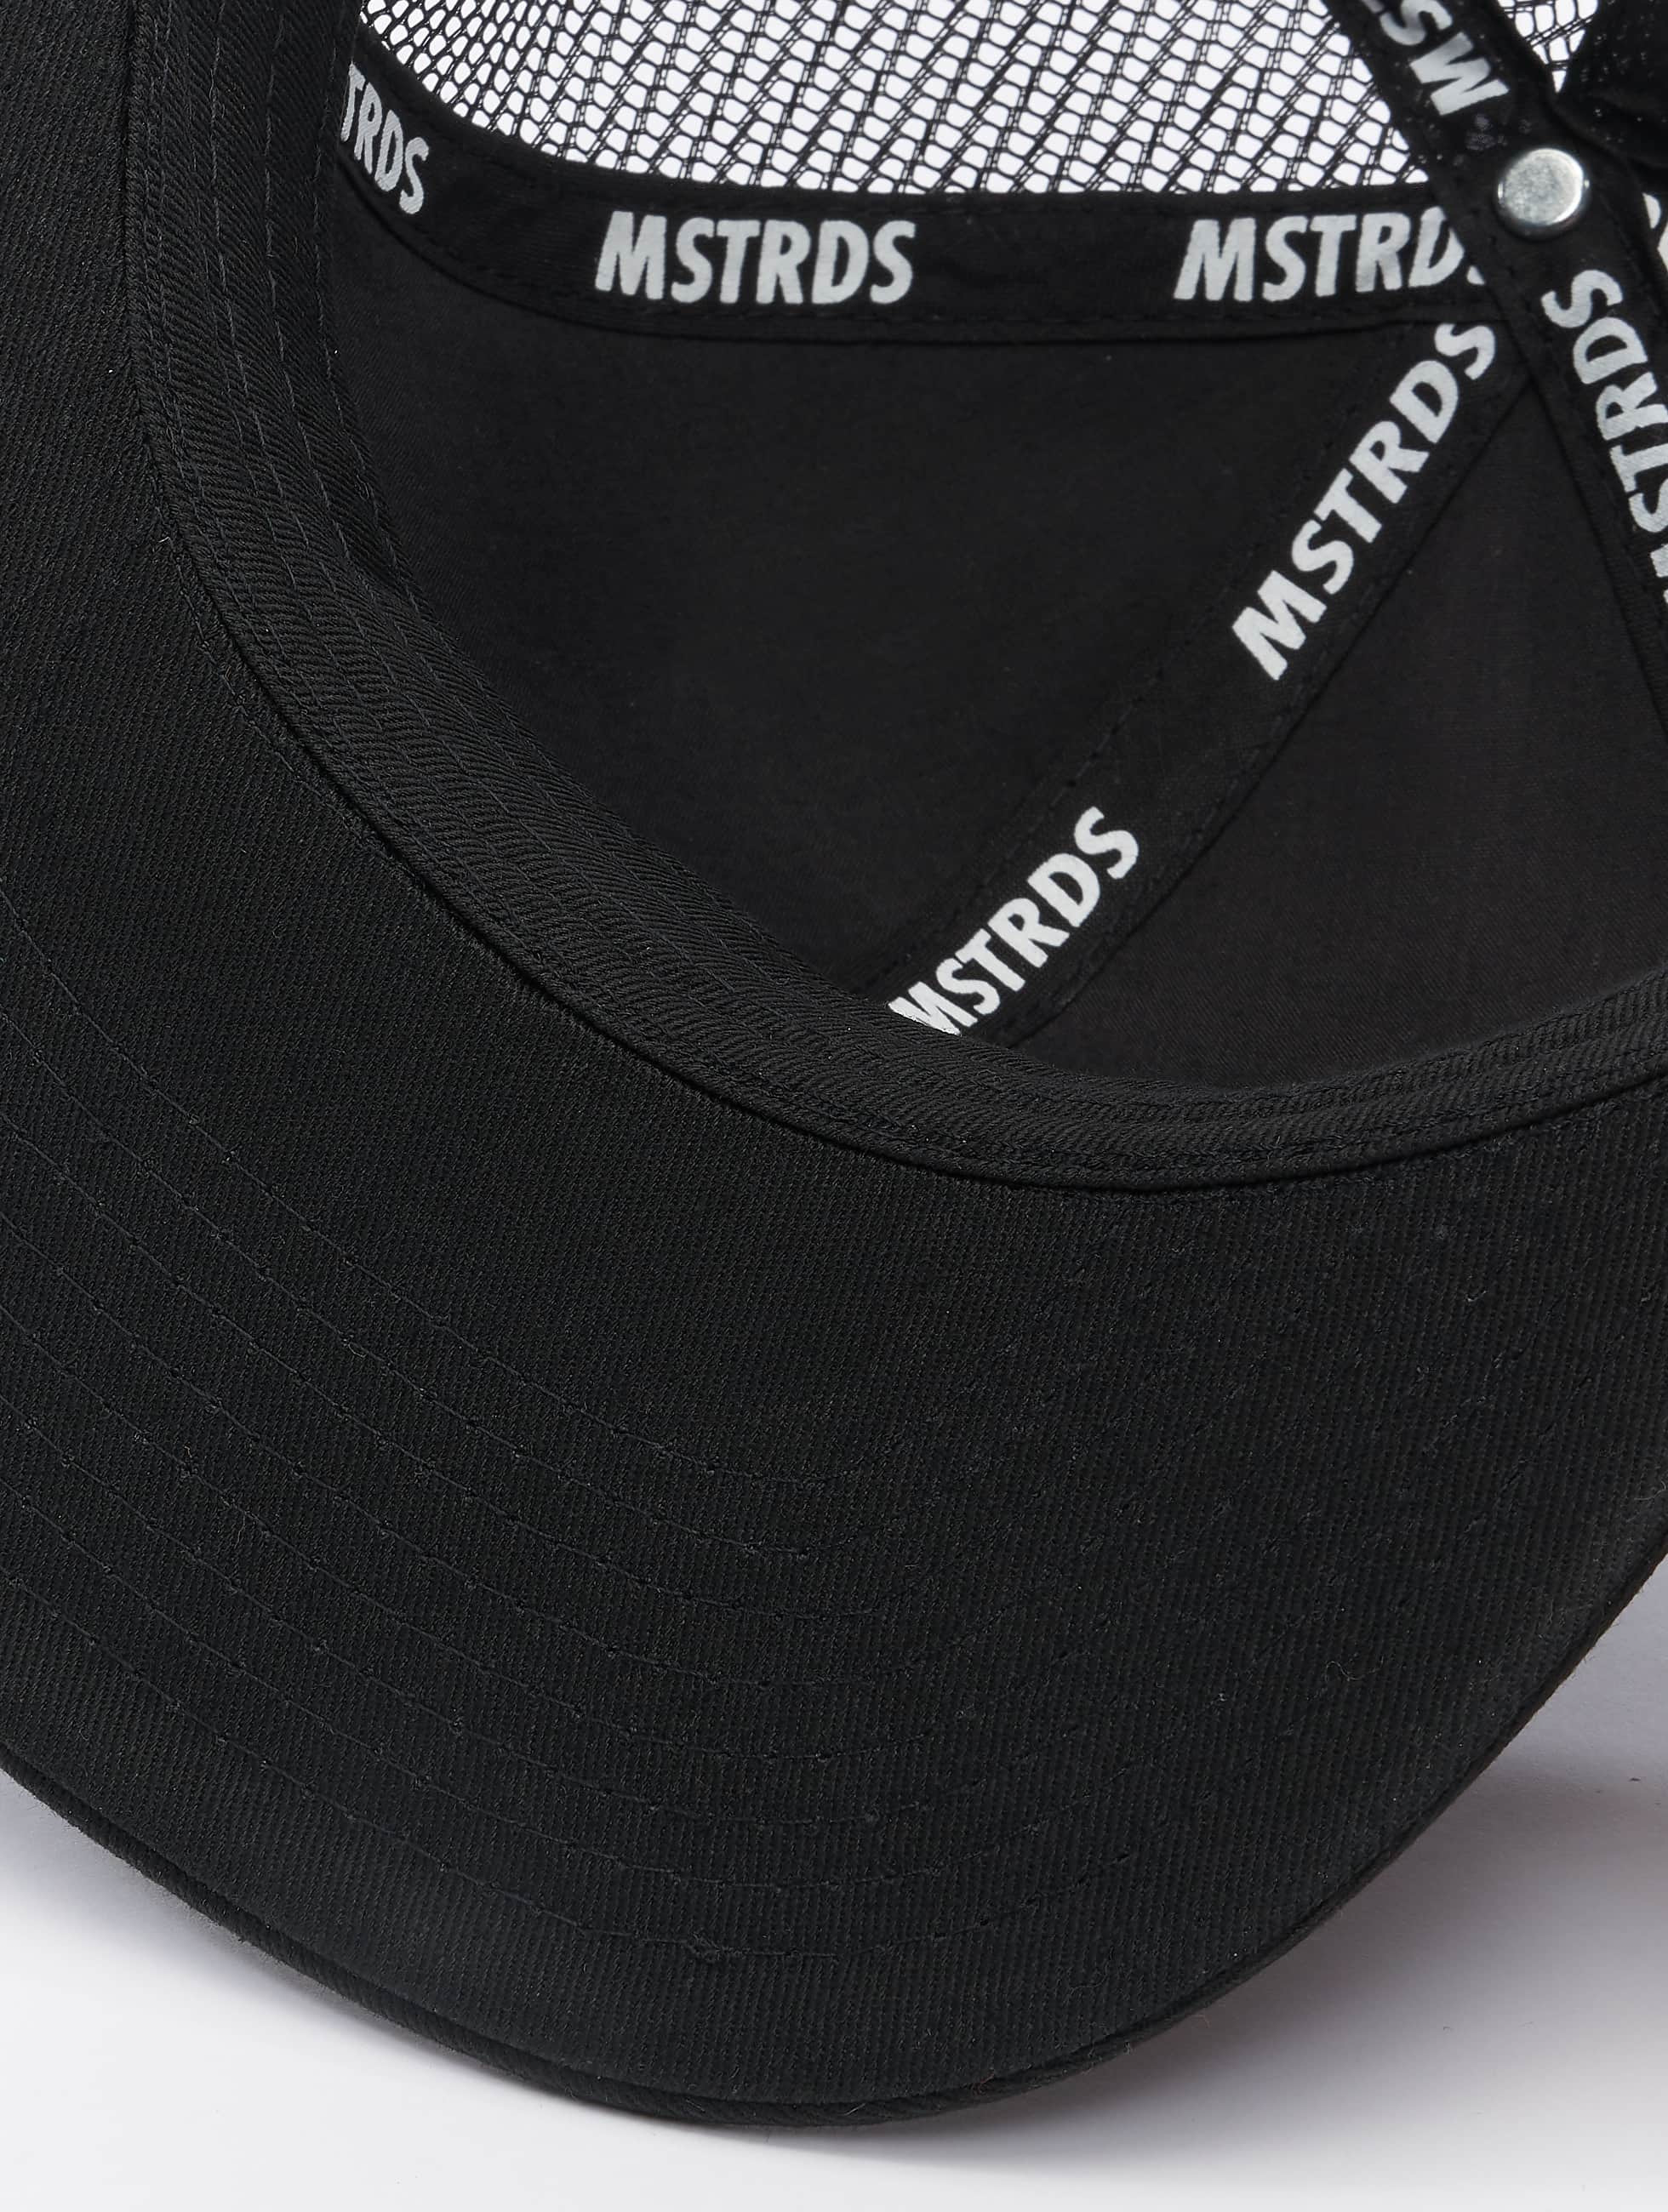 MSTRDS Casquette Trucker mesh Money Clip noir